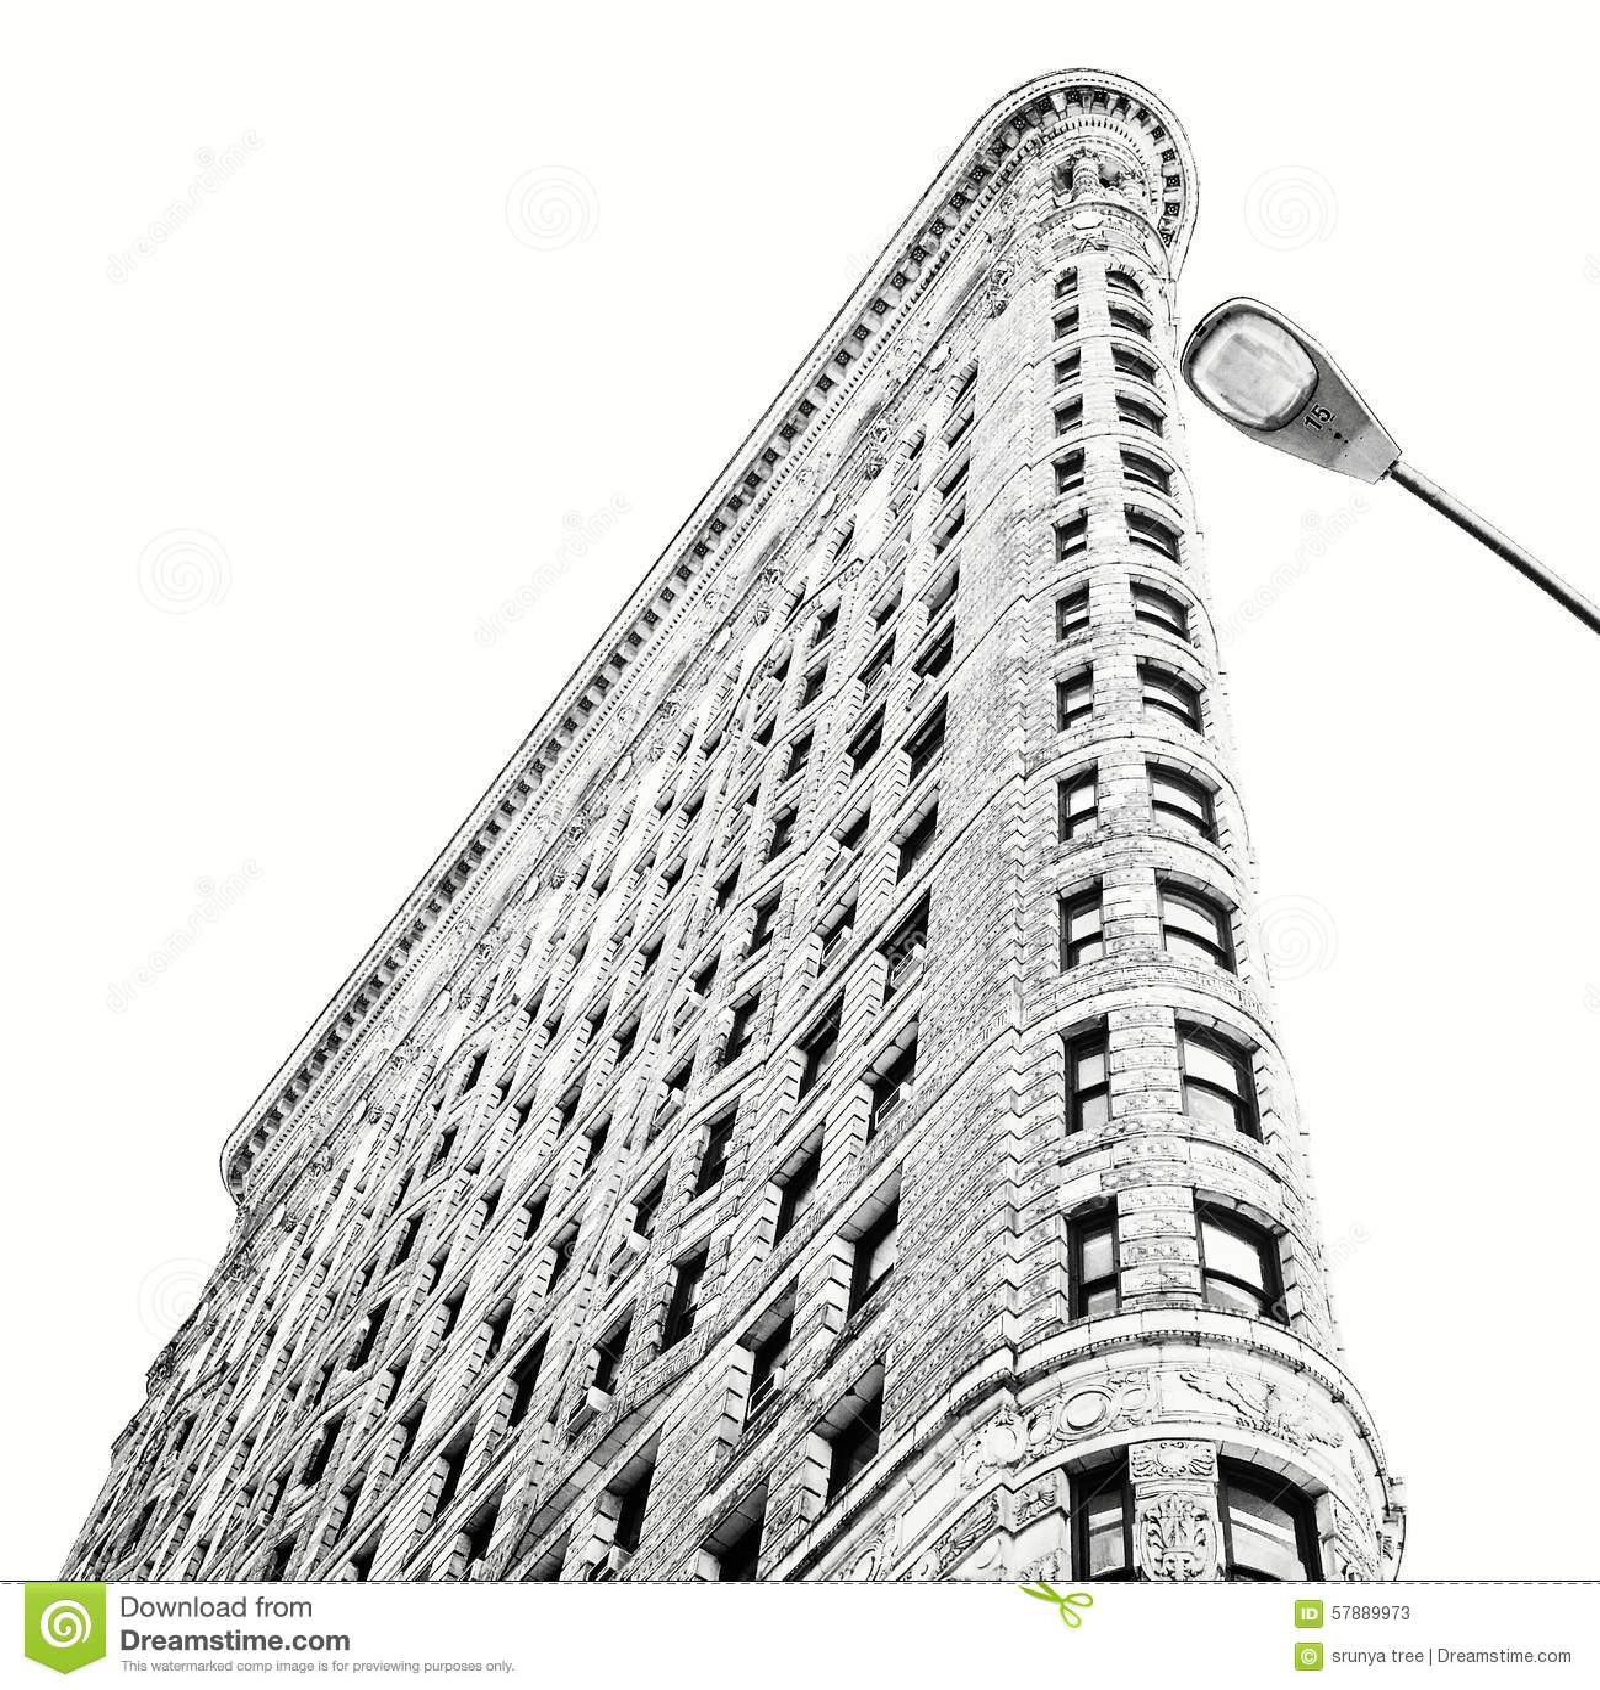 Flatiron Building Stock Photo - Image: 57889973